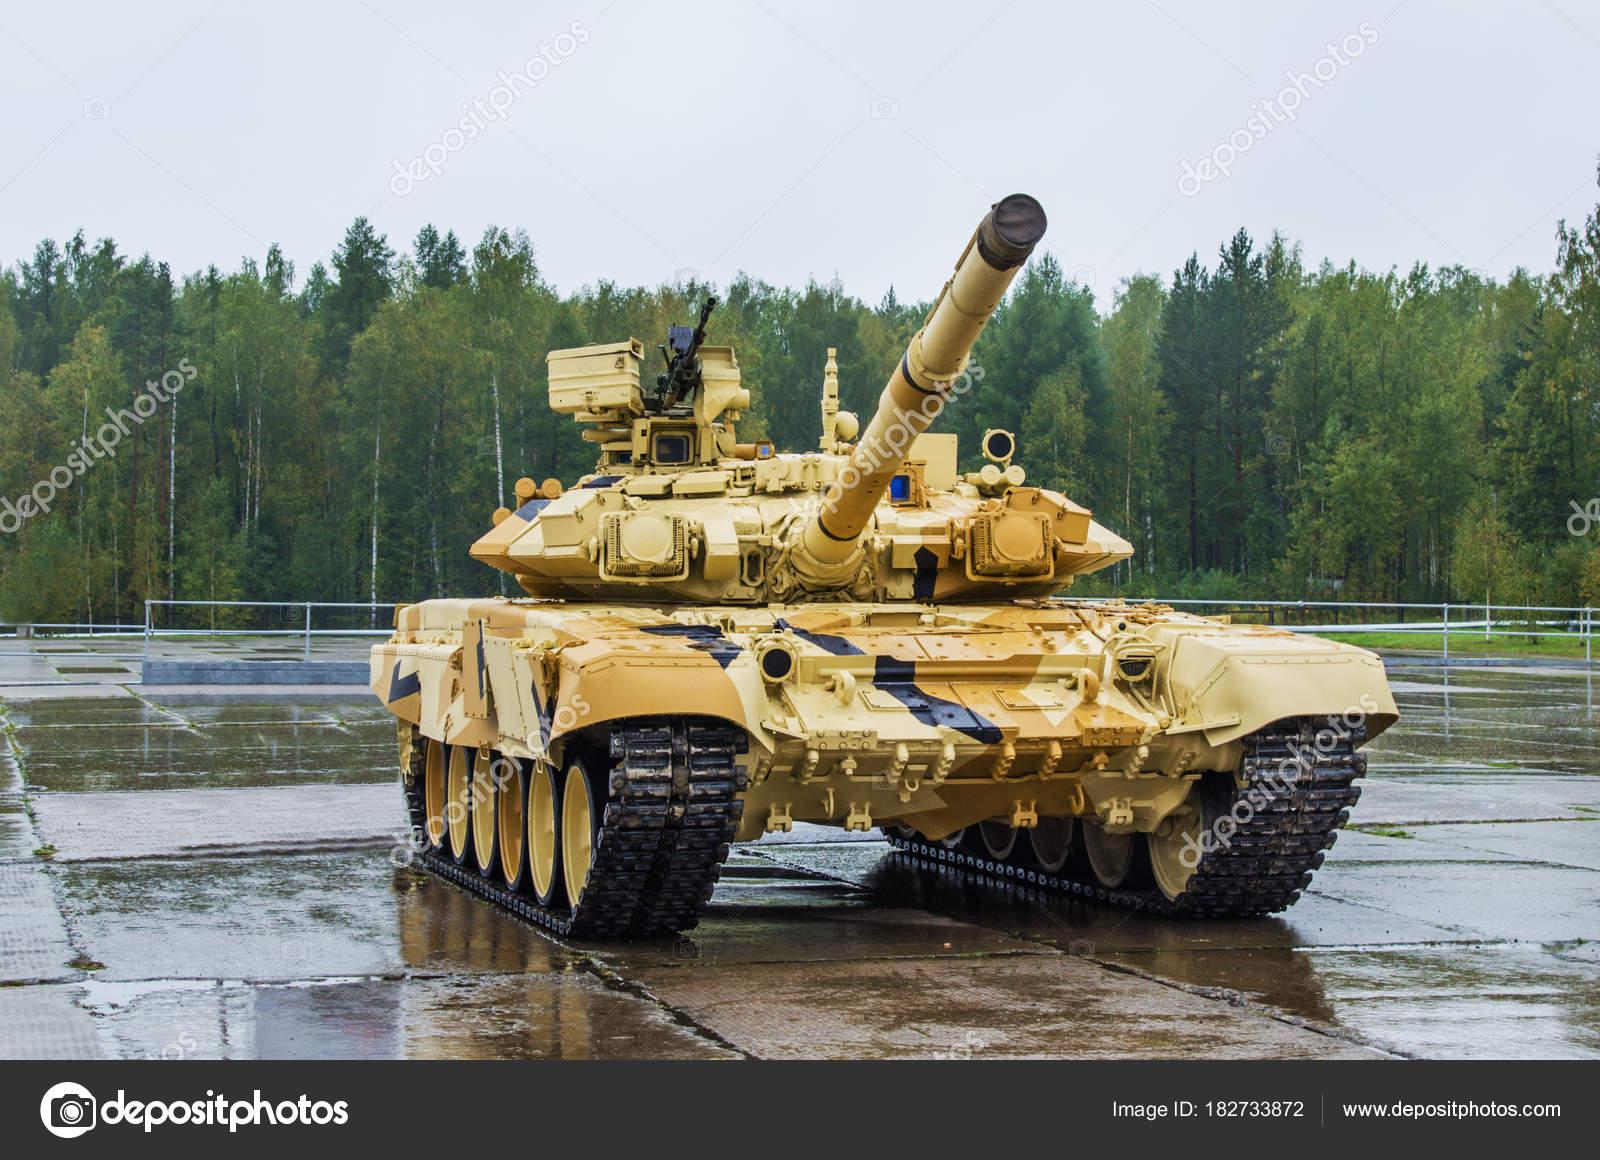 [Obrazek: depositphotos_182733872-stock-photo-russ...-t-90s.jpg]